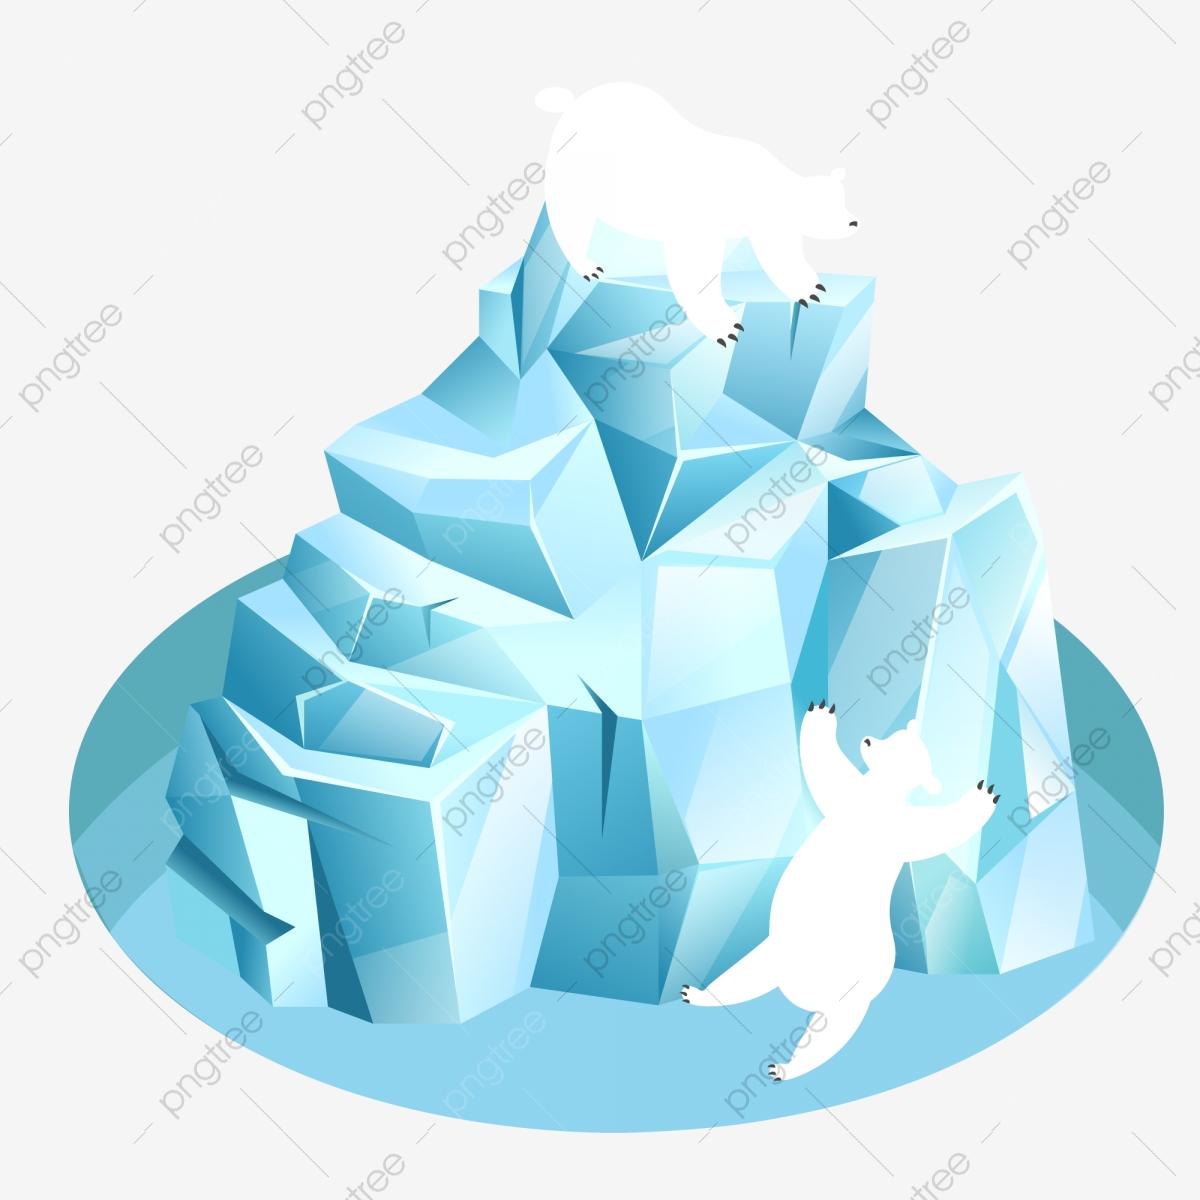 Glacier clipart vector. Arctic cold climate polar